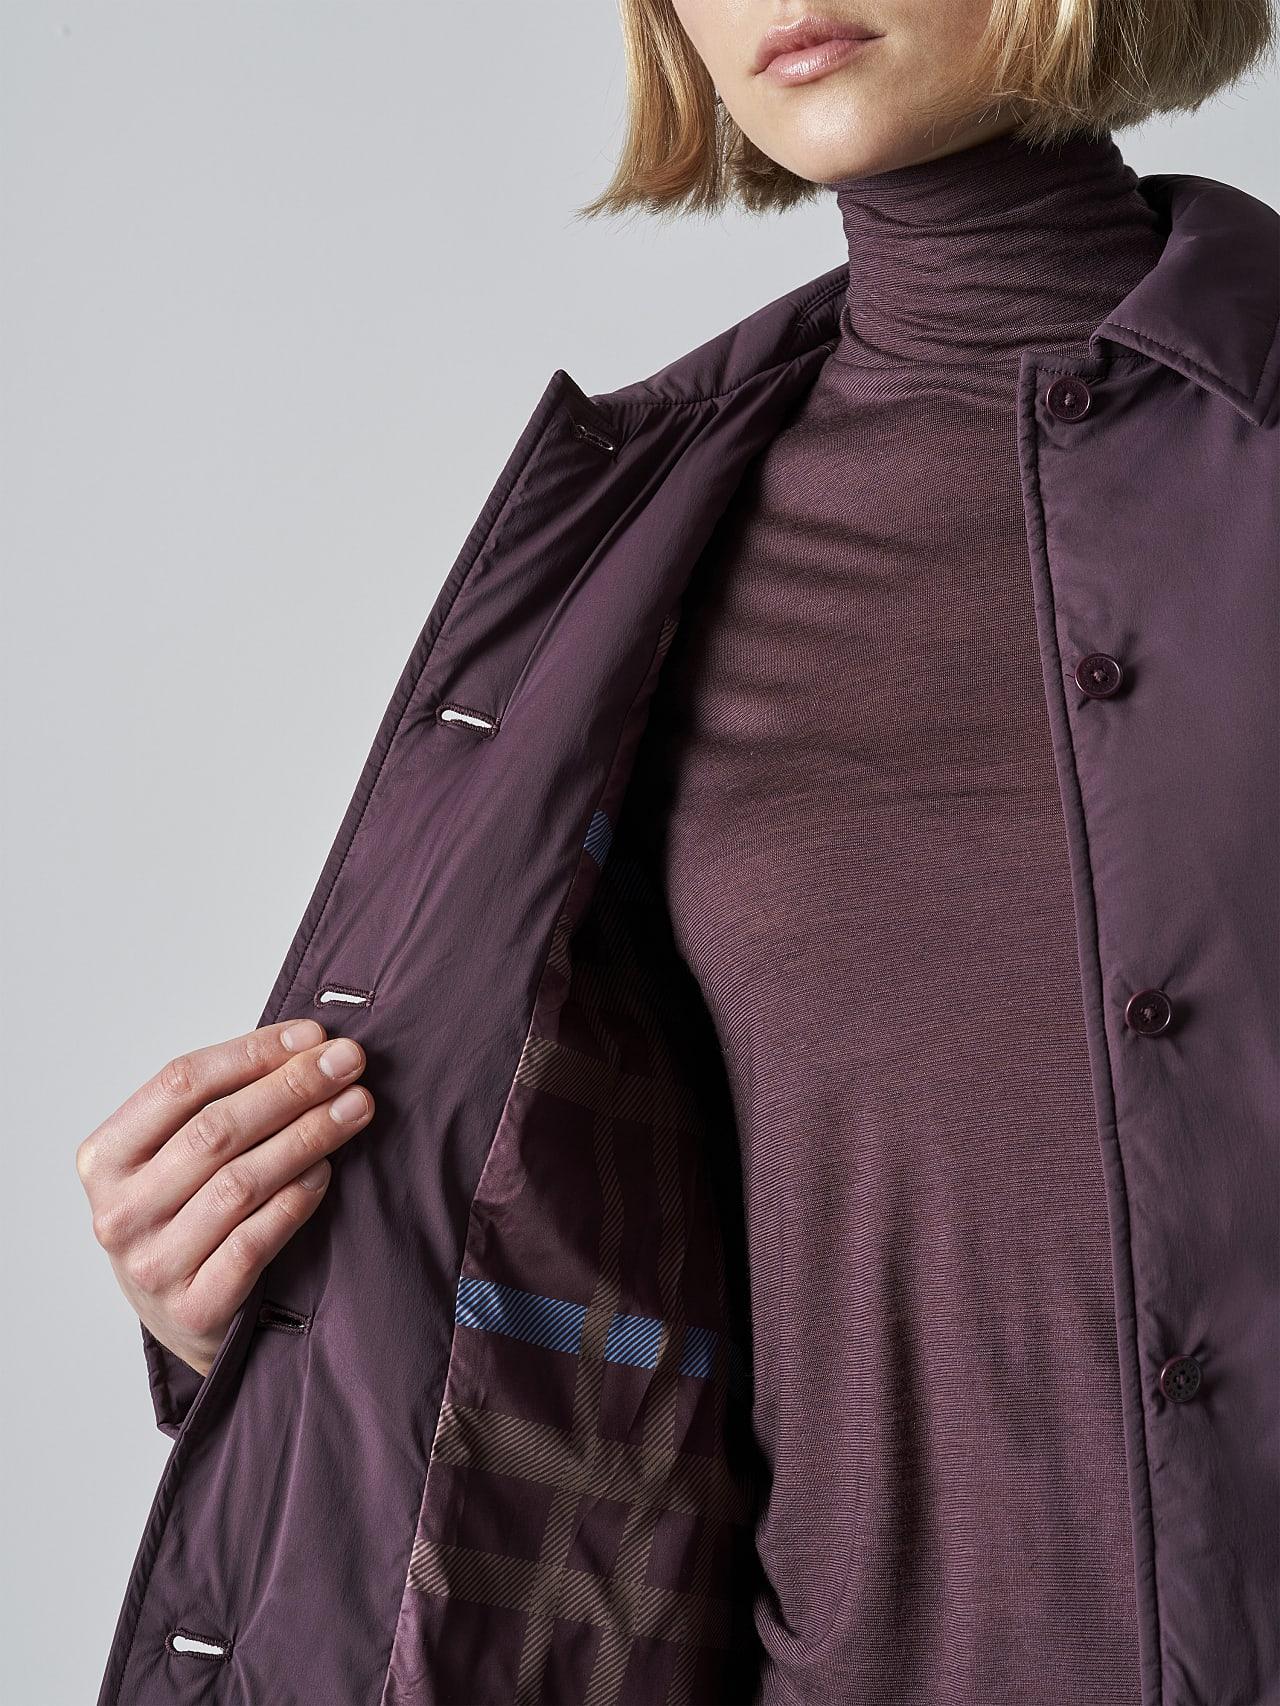 OSHEN V1.Y5.02 PrimaLoft® Overshirt Jacket Burgundy scene7.view.8.name Alpha Tauri